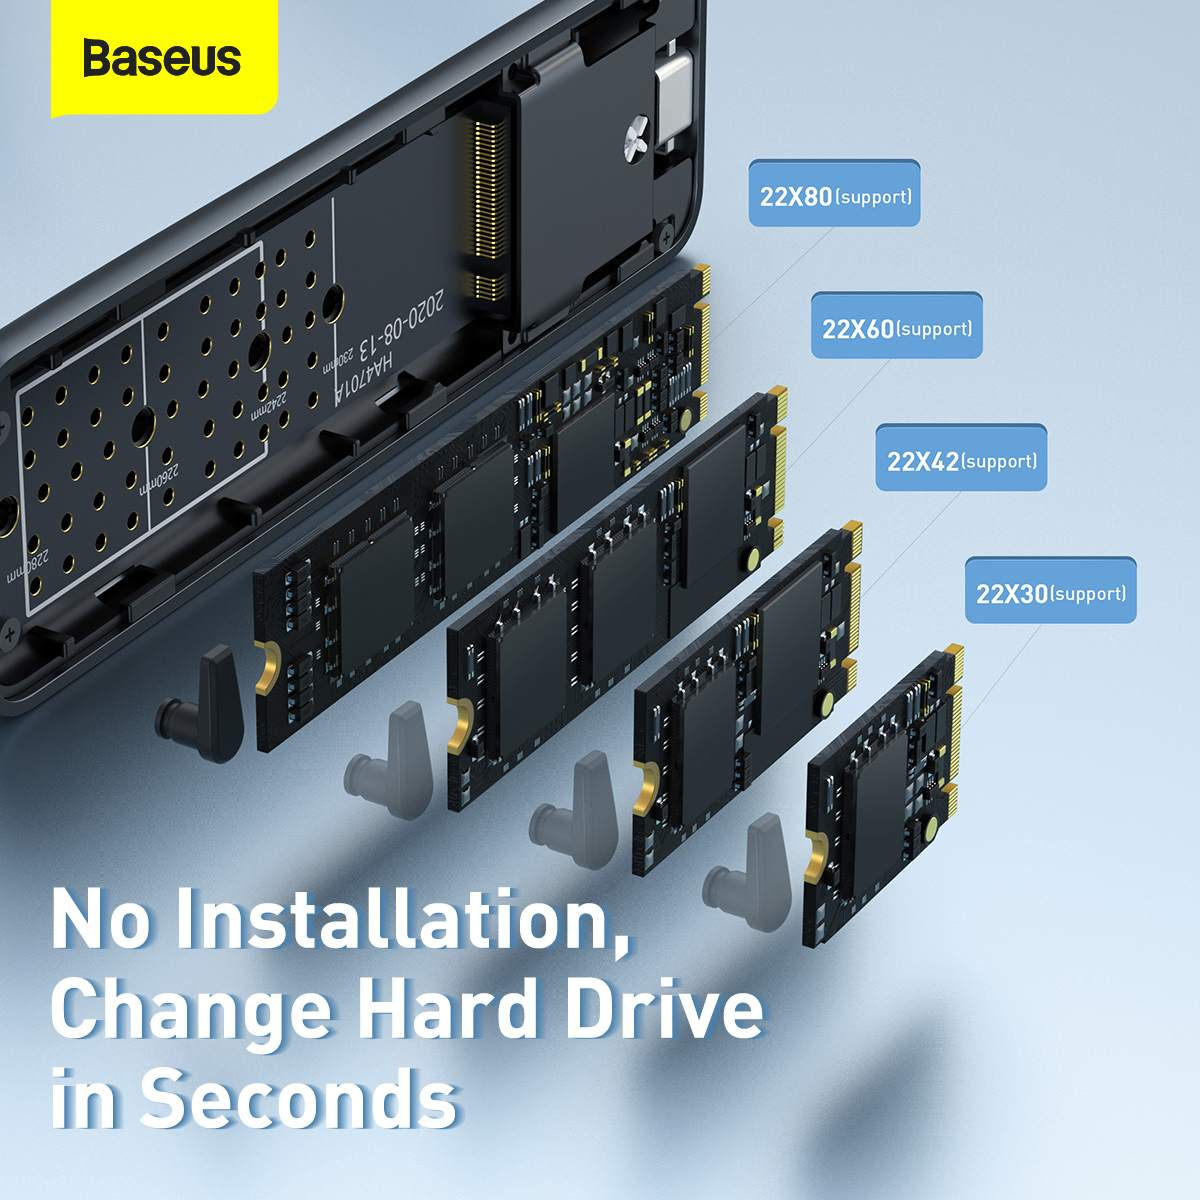 Baseus HUB Hard Disk Case Full Speed Series SSD Enclosure (Type-C - GEN2) Space Gray (CAYPH-F0G)